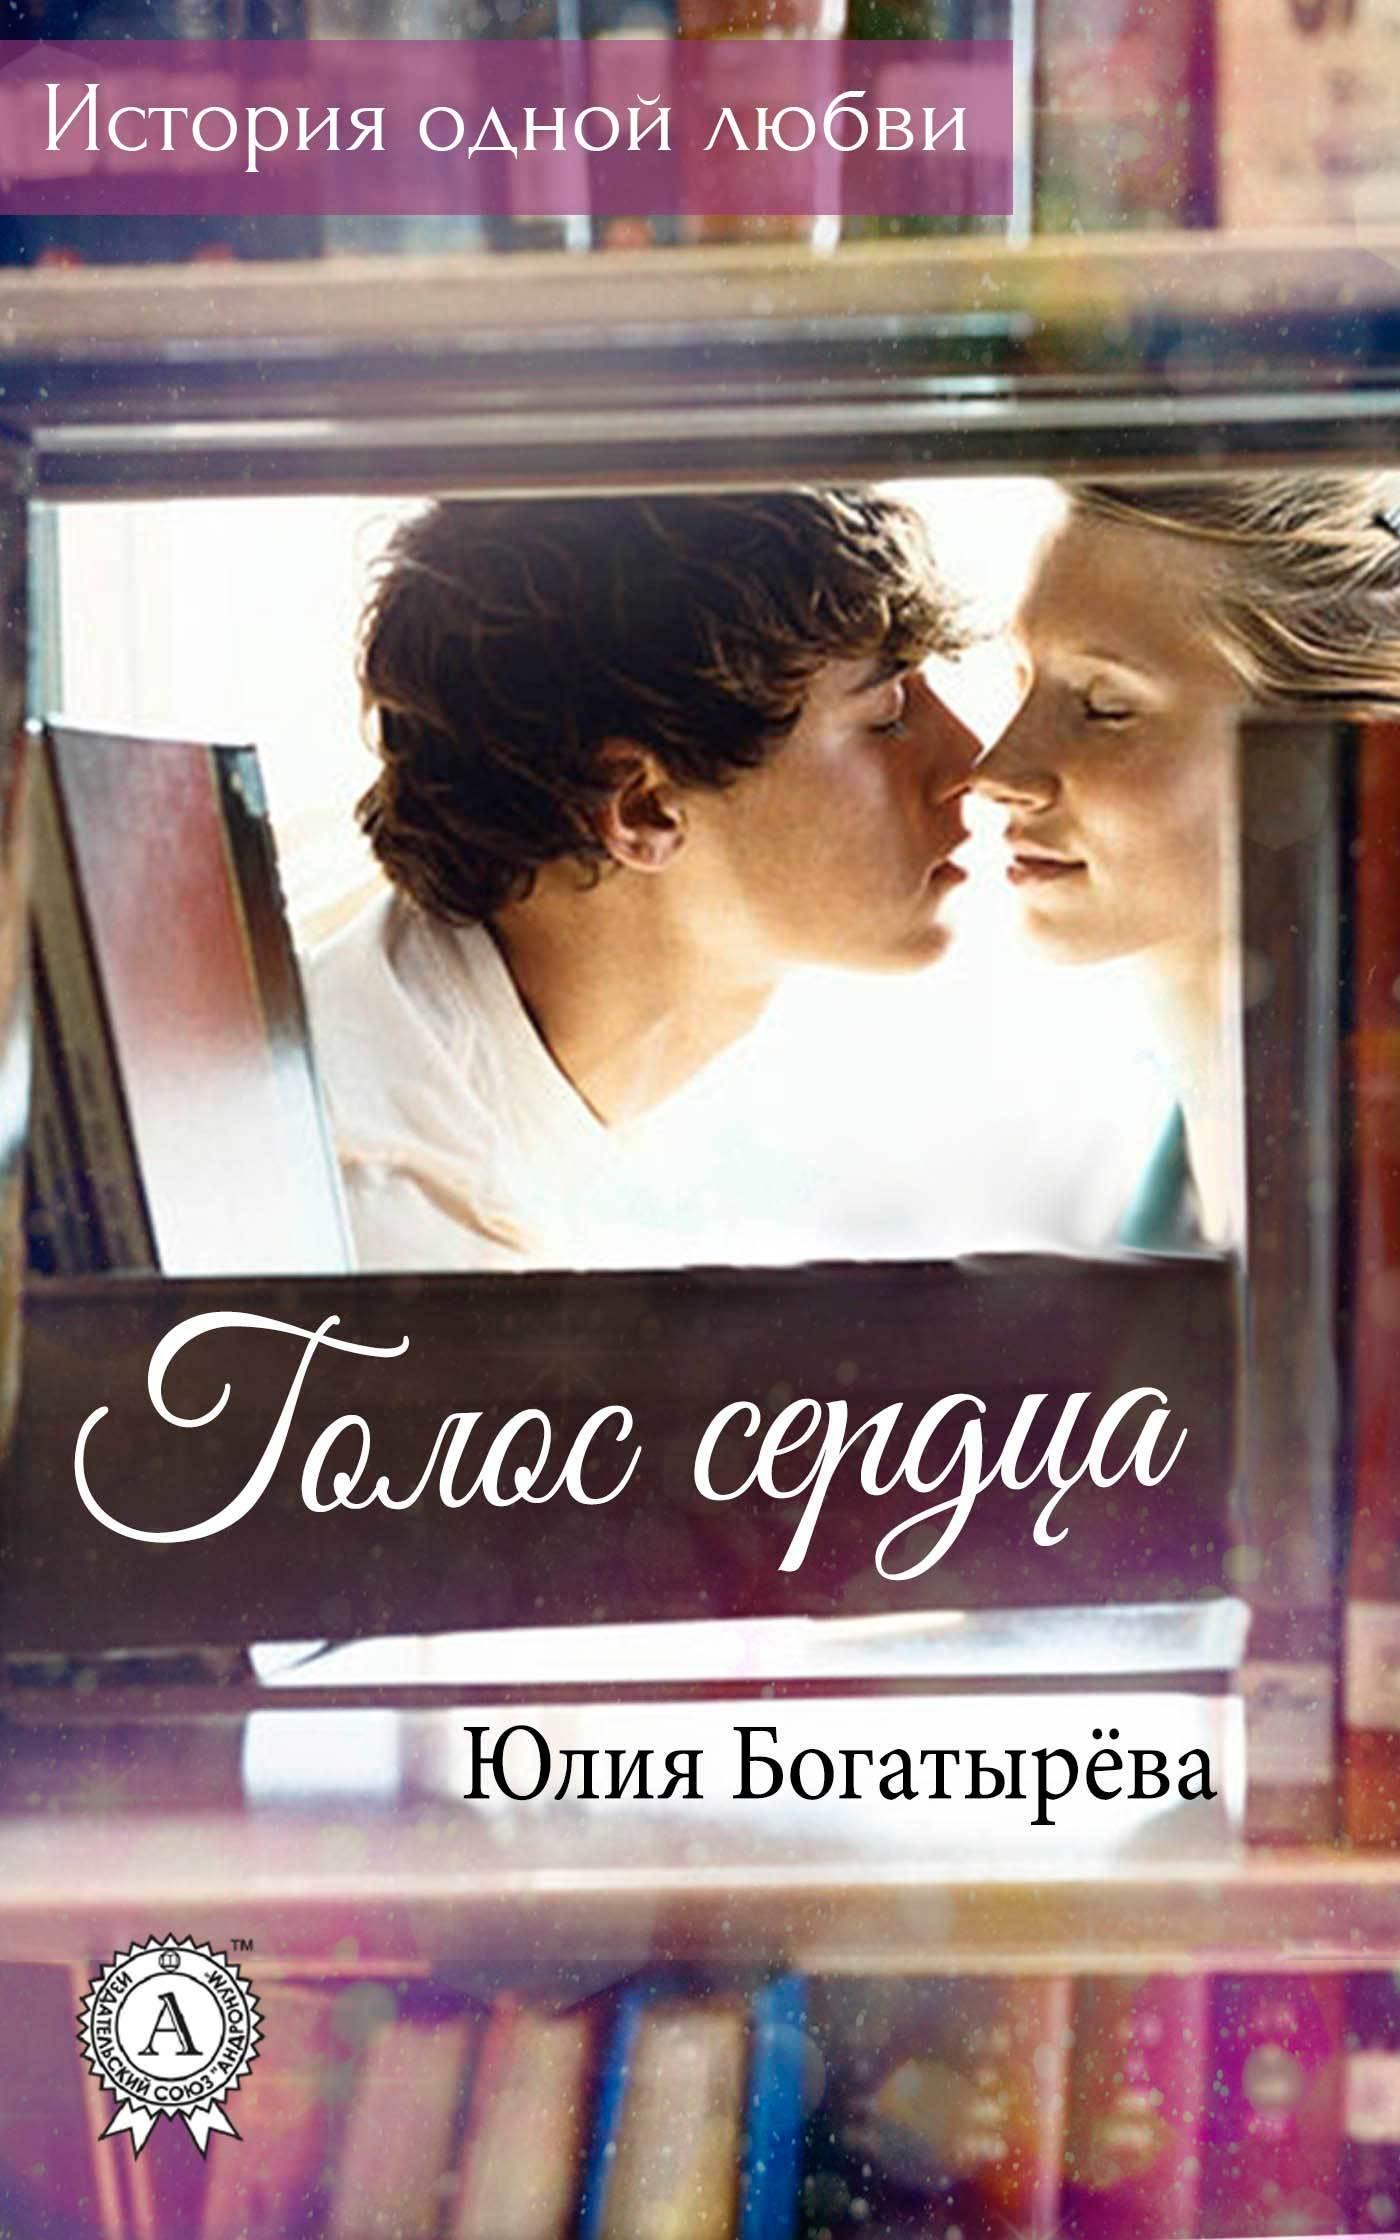 Юлия Богатырёва - Голос сердца